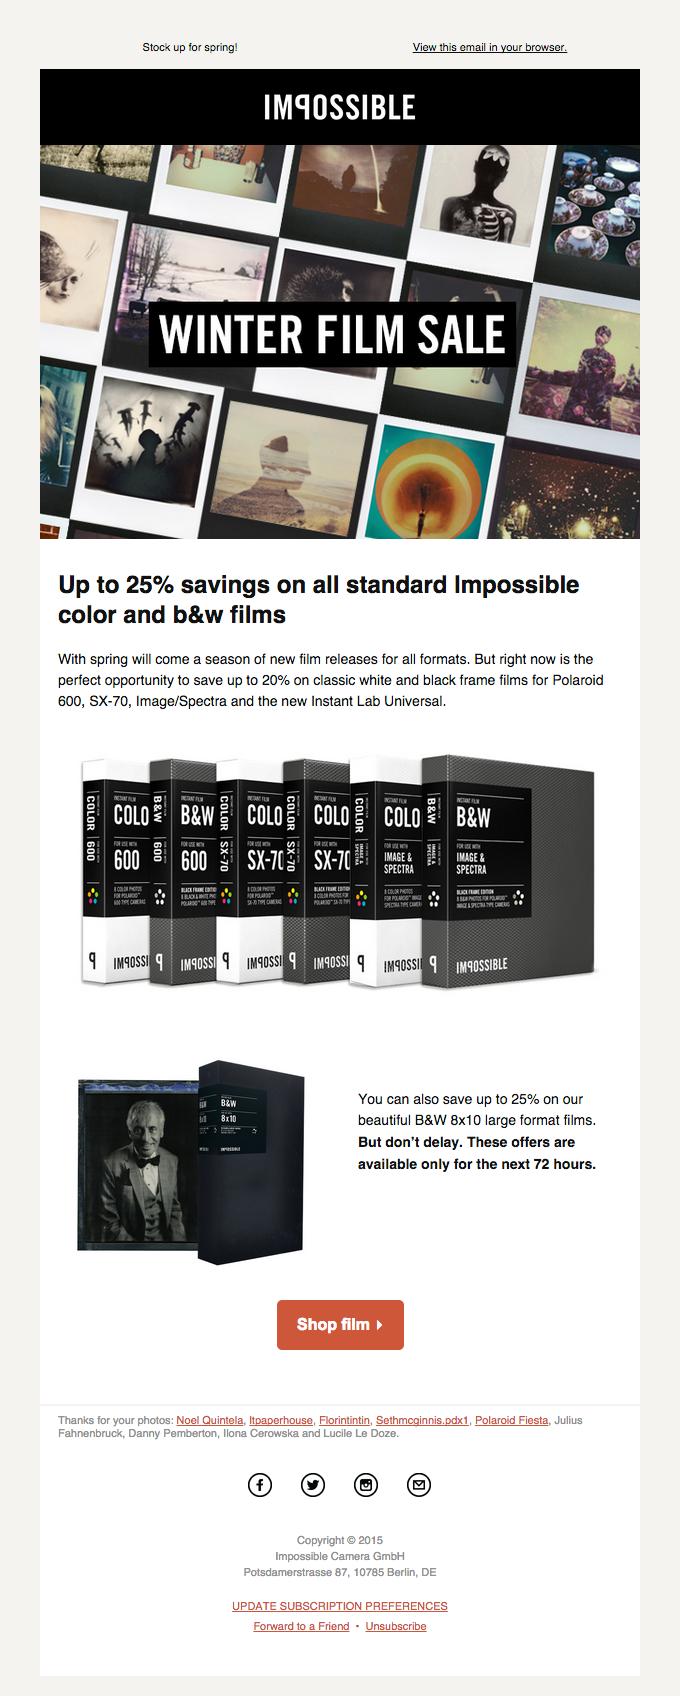 End of season sale of all standard Color & B&W films